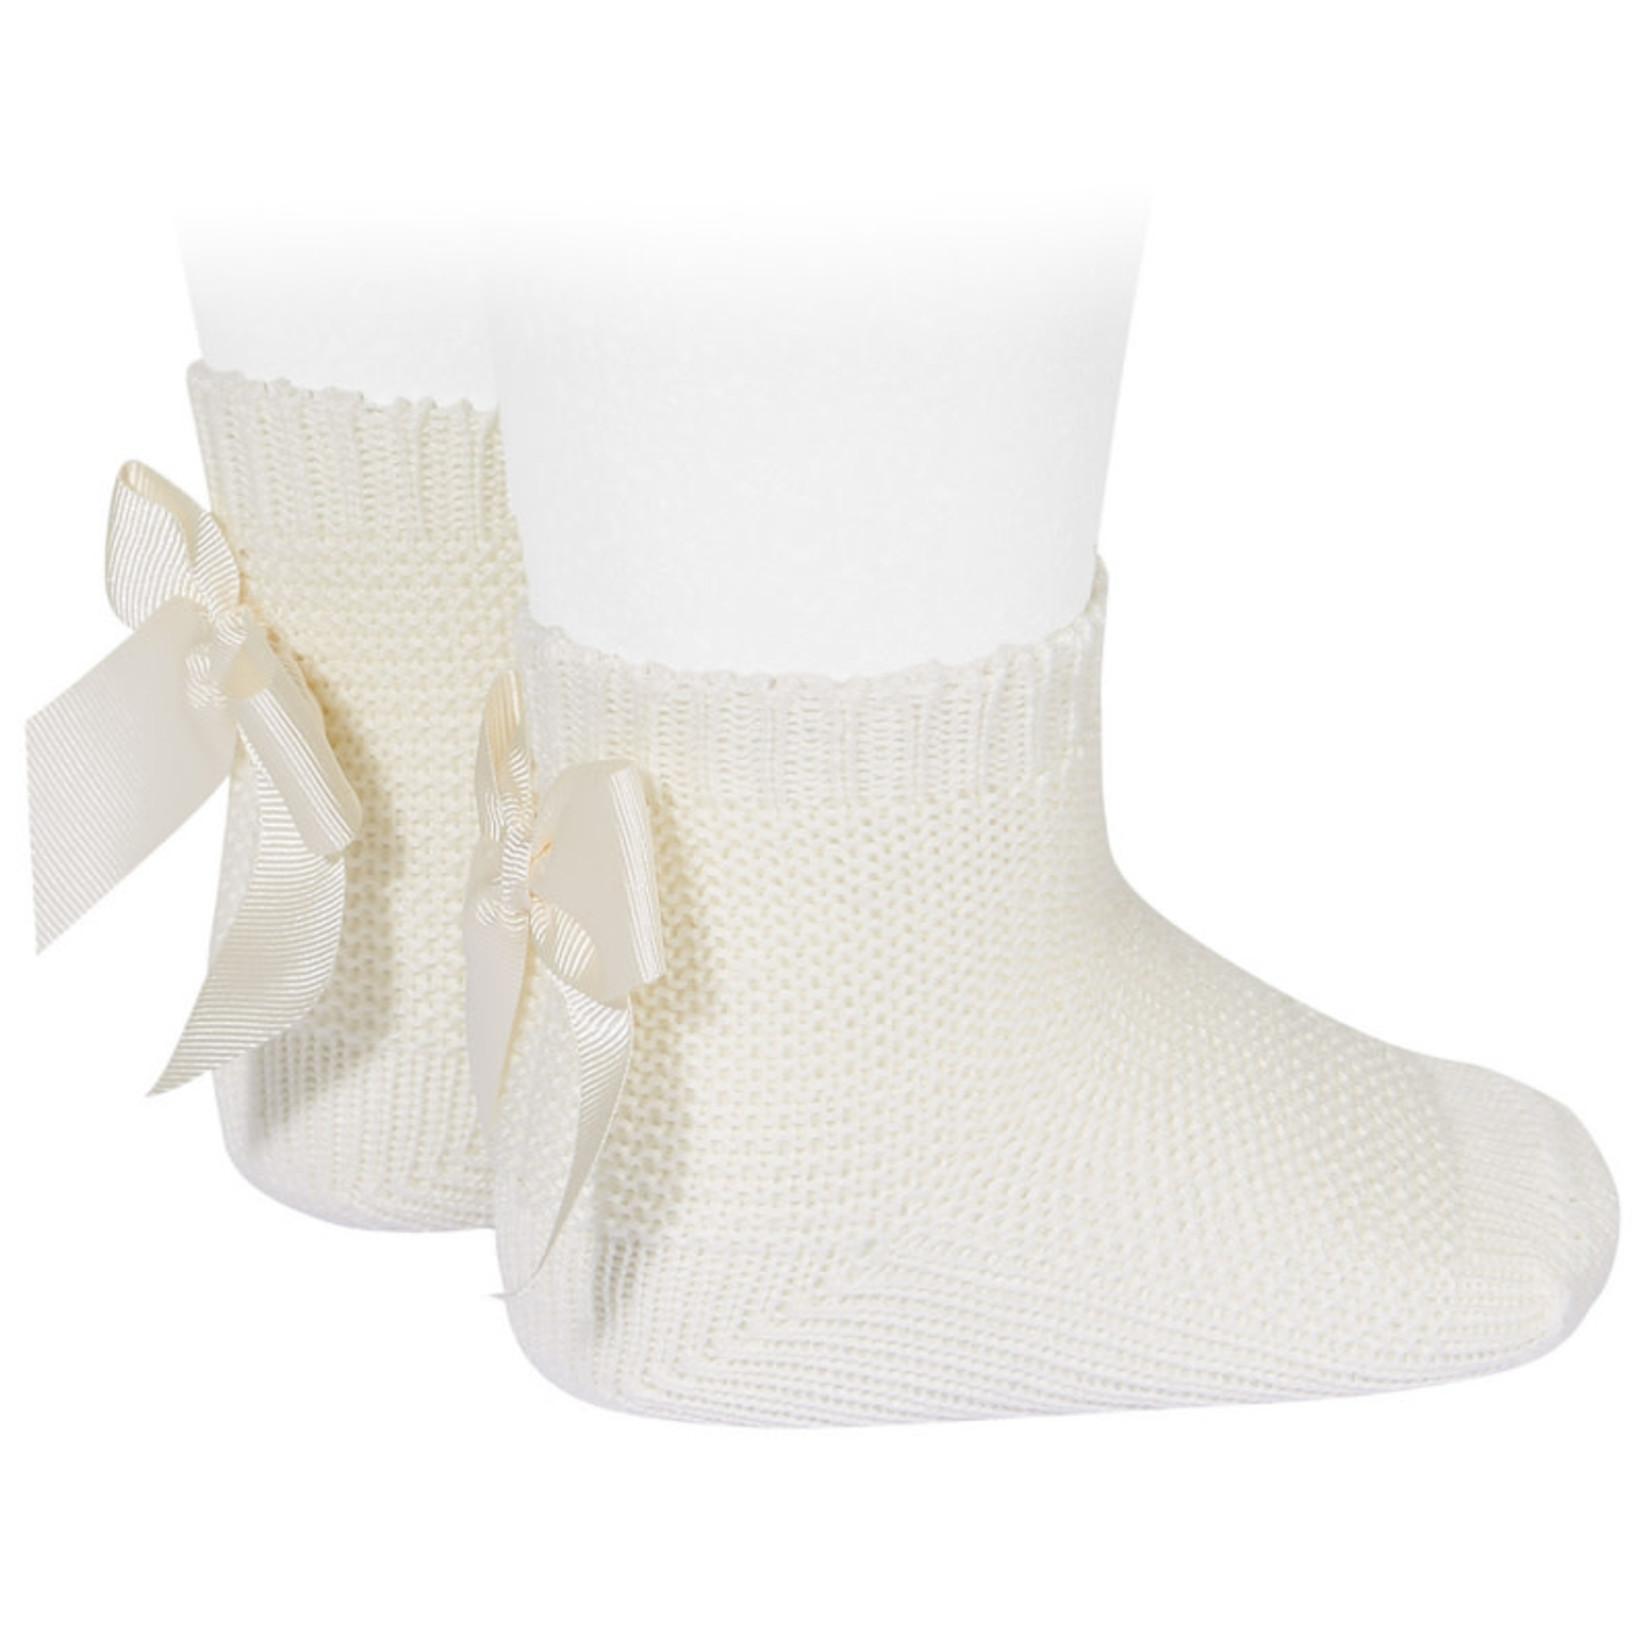 Socks Open b/Bow - Creme